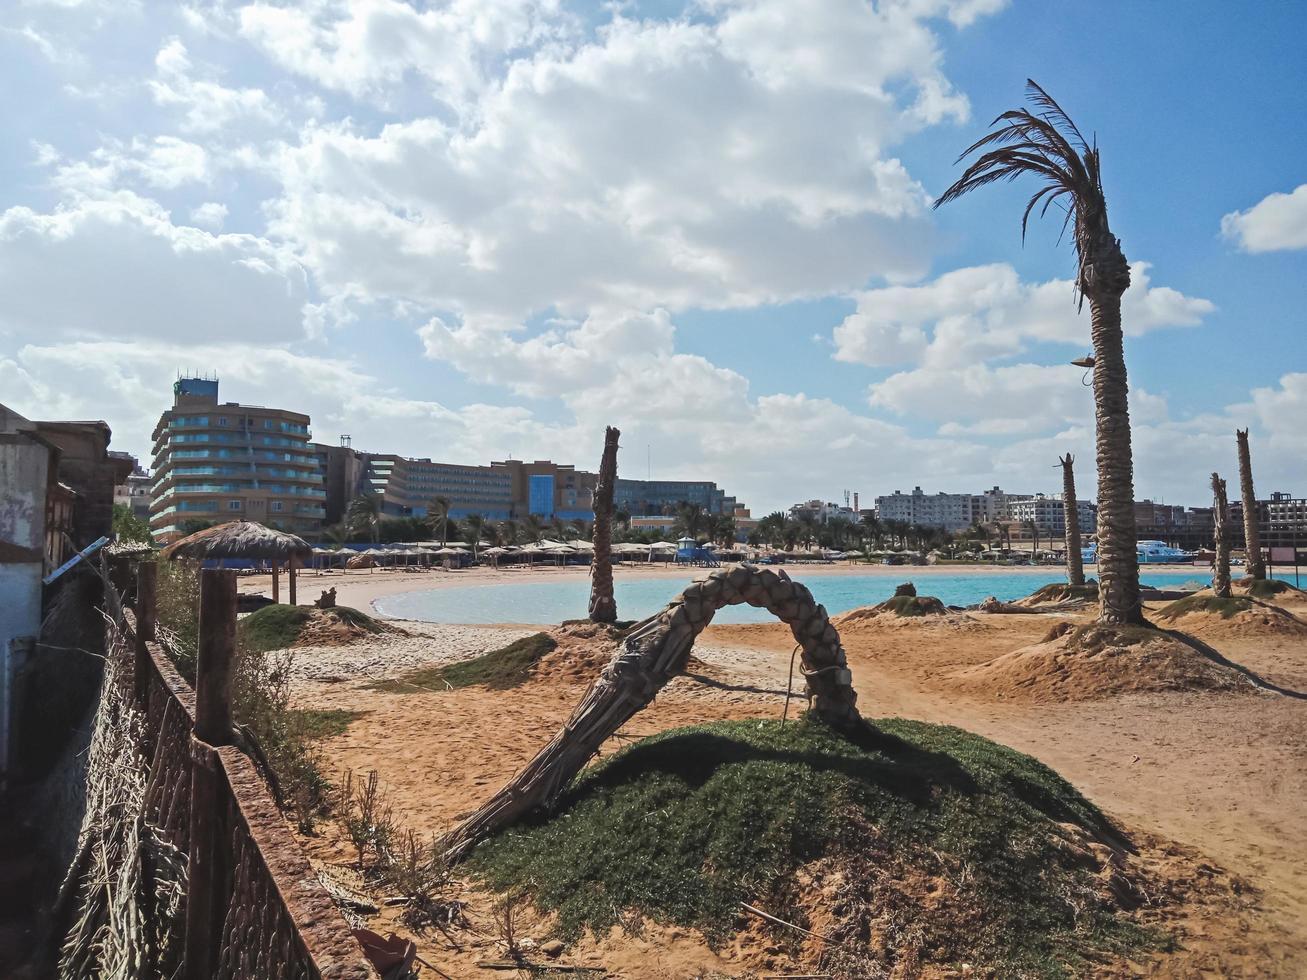 gamla palmer på stranden i Hurghada City, Egypten foto